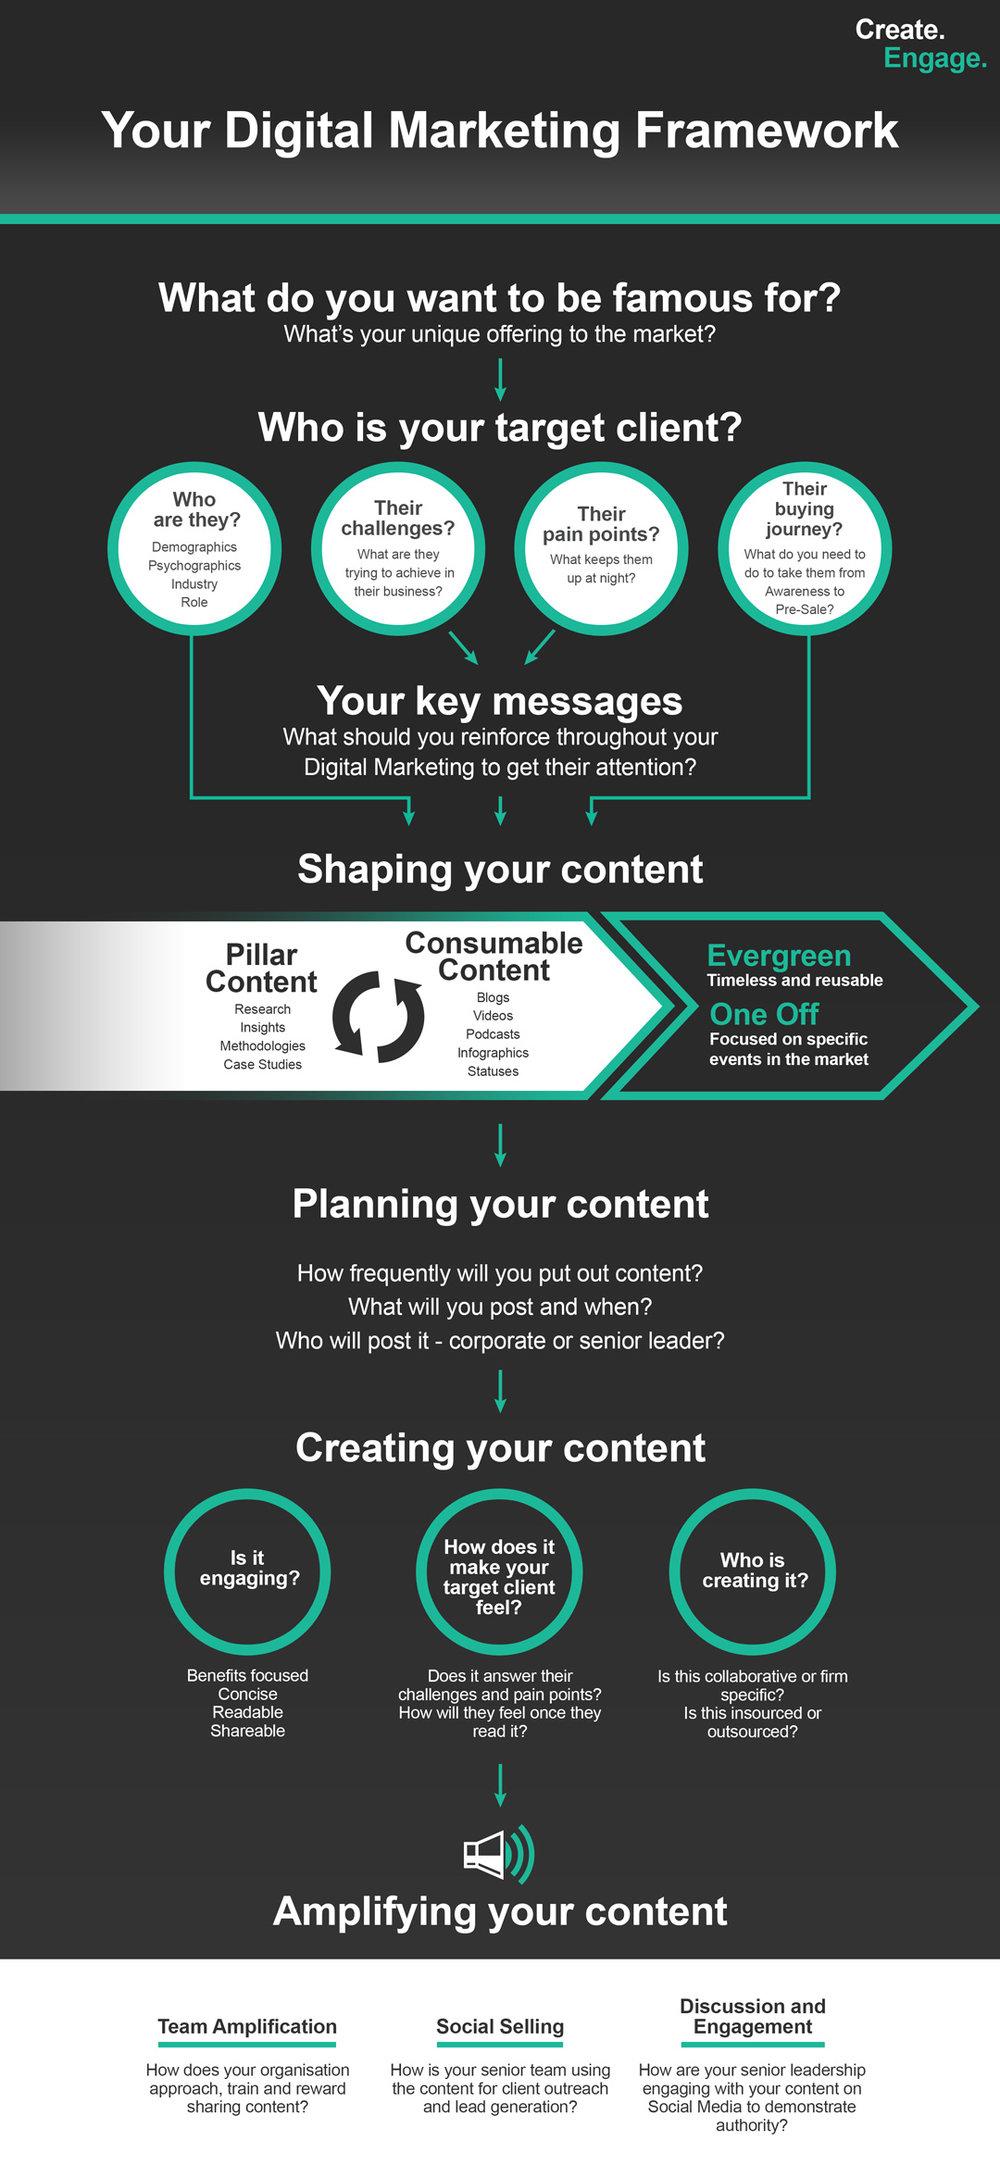 Create Engage Digital Marketing Framework.jpg